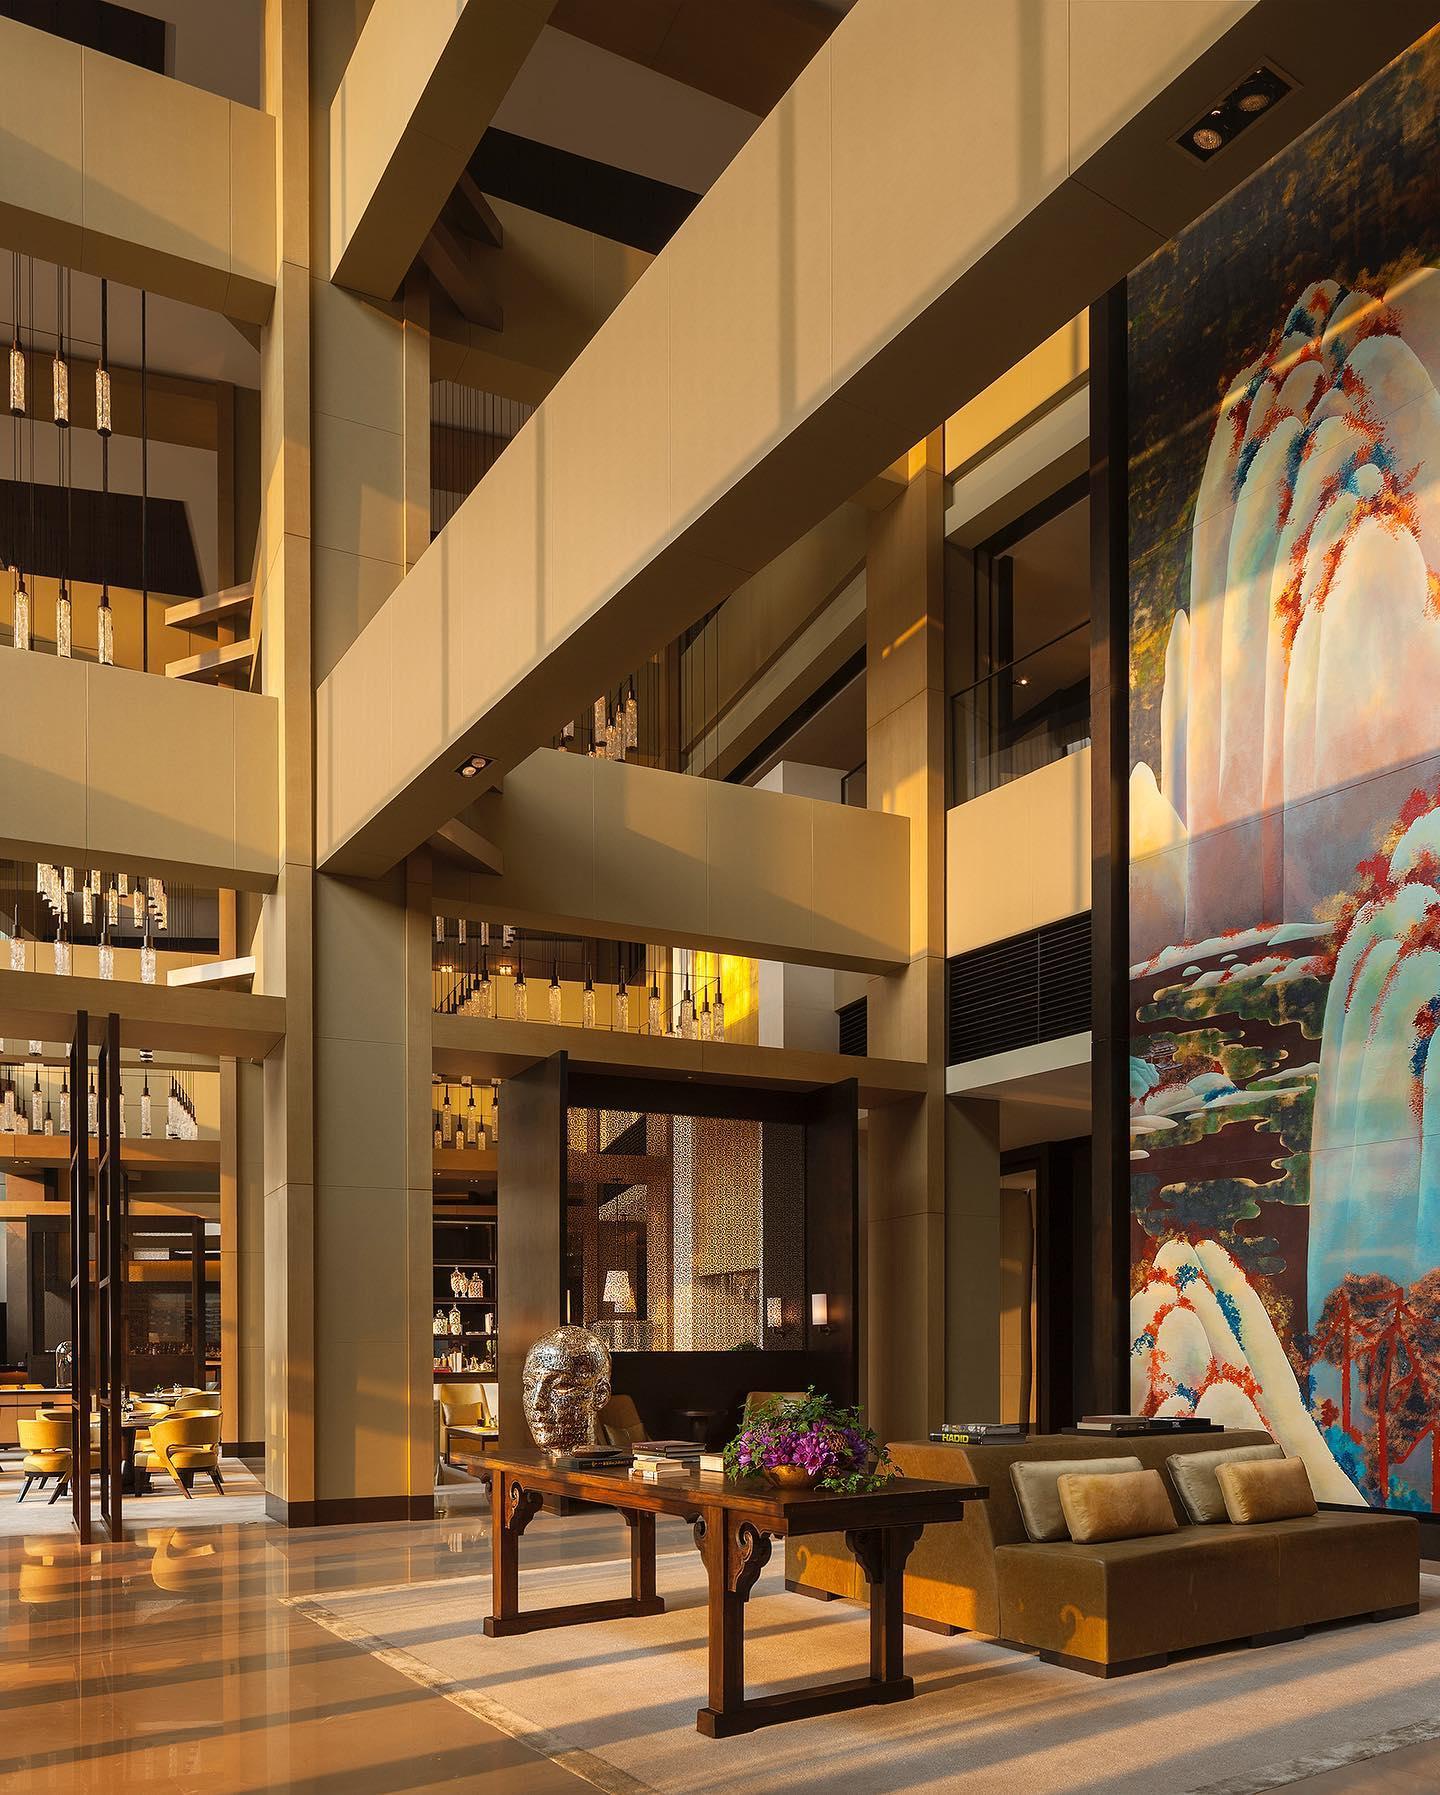 Rosewood Beijing, luna de miel en China, hoteles para luna de miel en China - Wedding Hub - 020